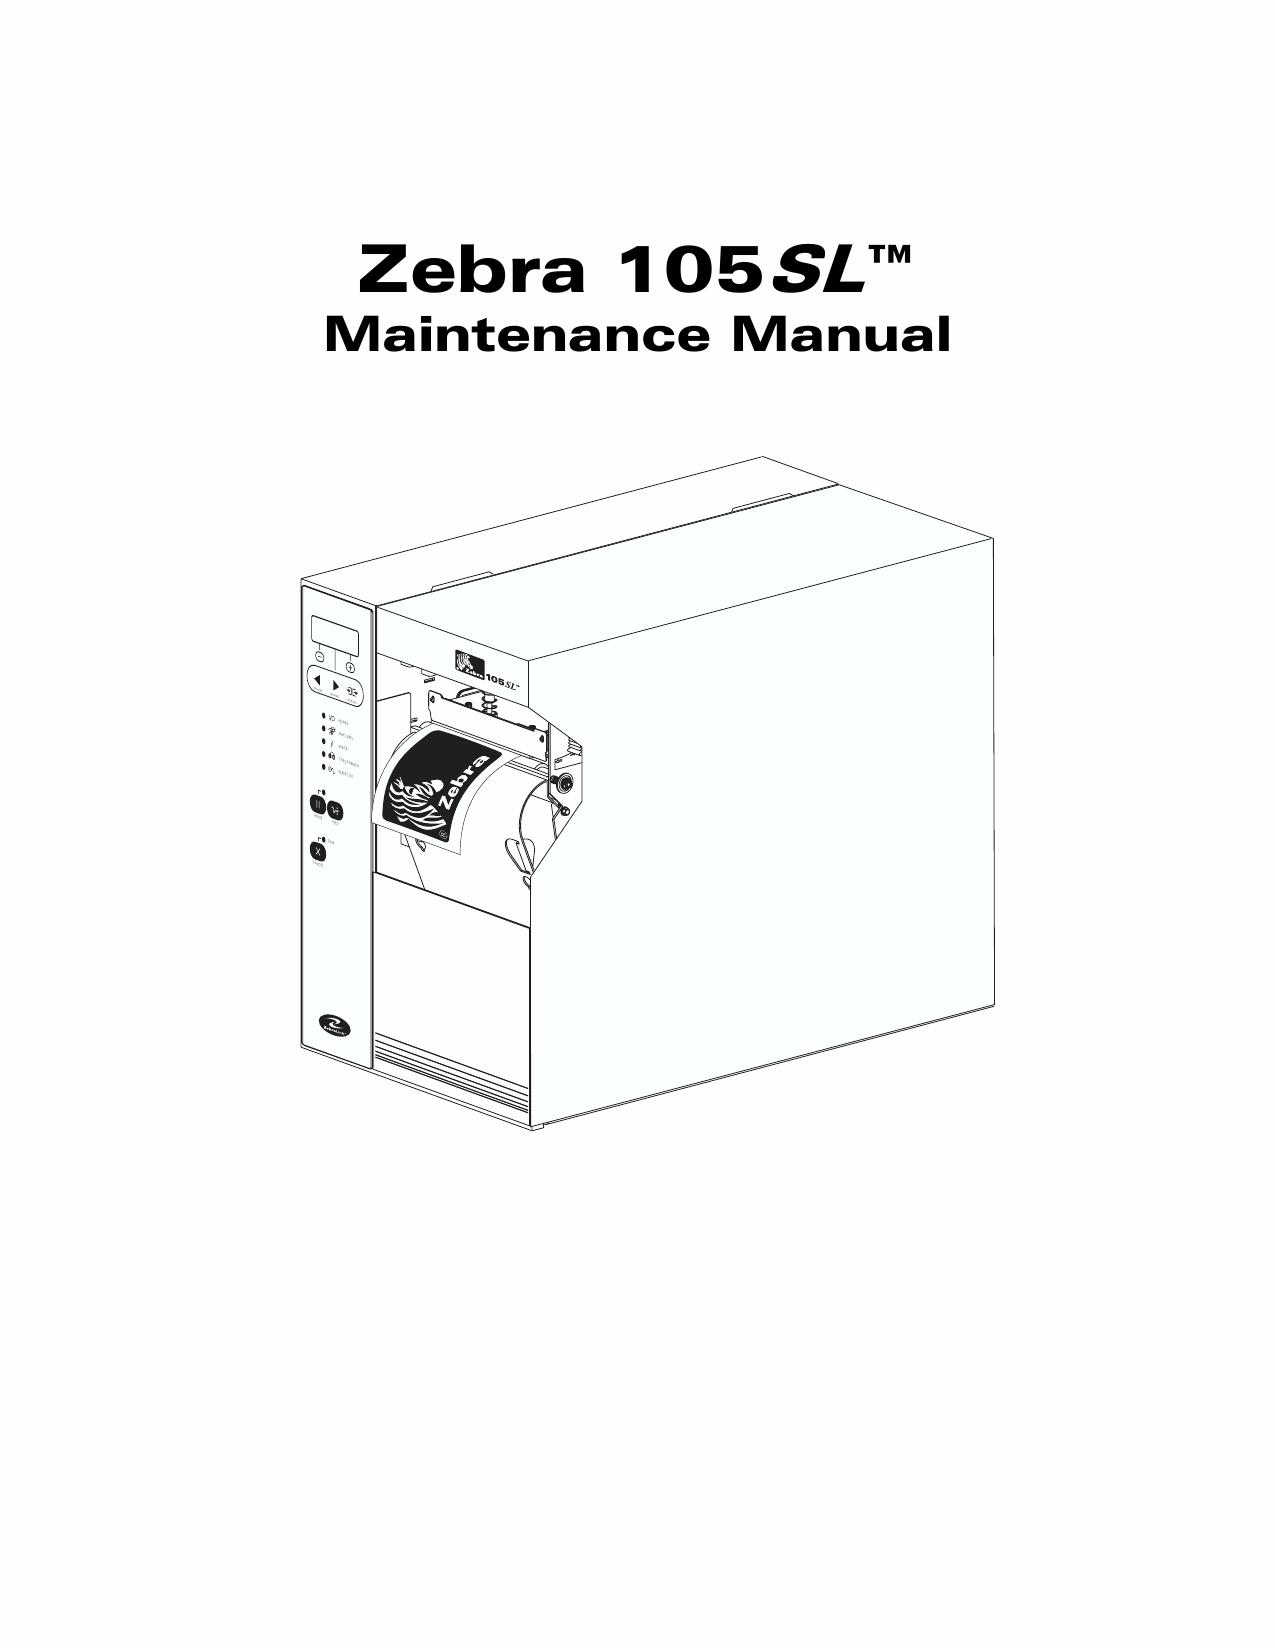 Zebra 105sl plus maintenance manual